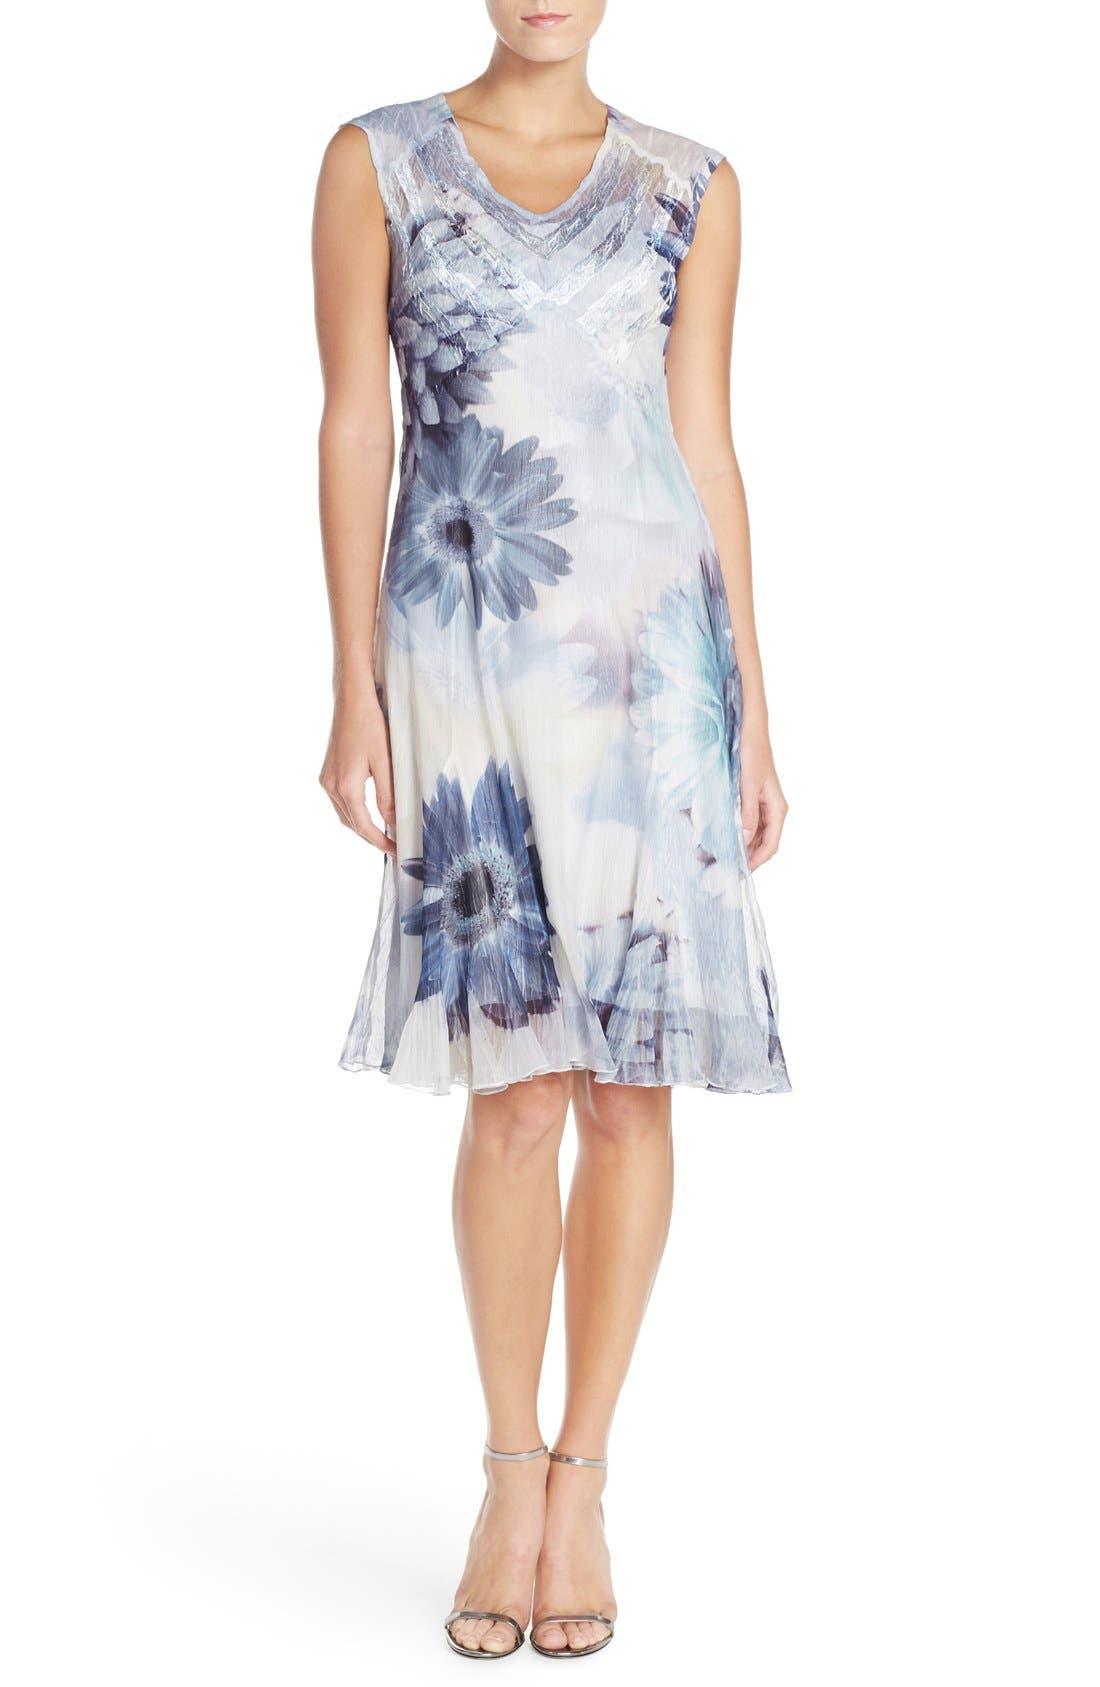 Alternate Image 1 Selected - Komarov Floral Print Chiffon A-Line Dress (Regular & Petite)